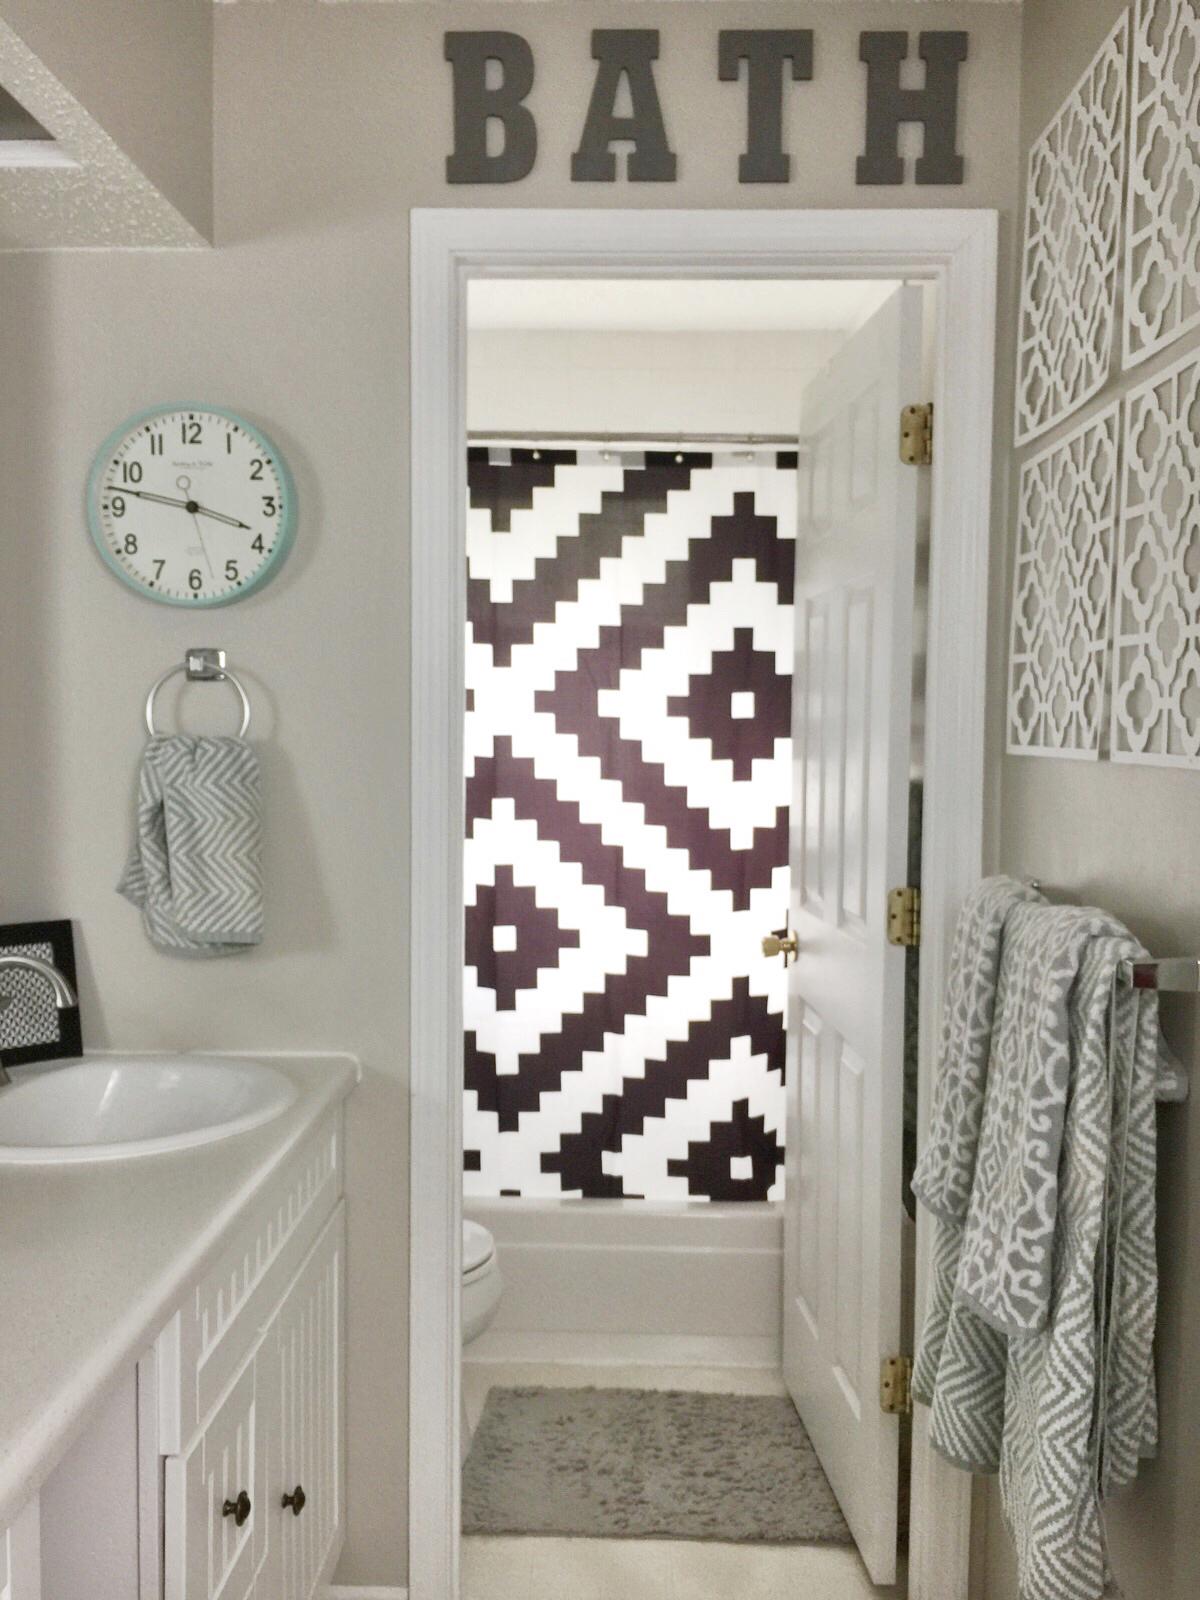 Our easy bathroom update birkley lane interiors for Bathroom decor essentials